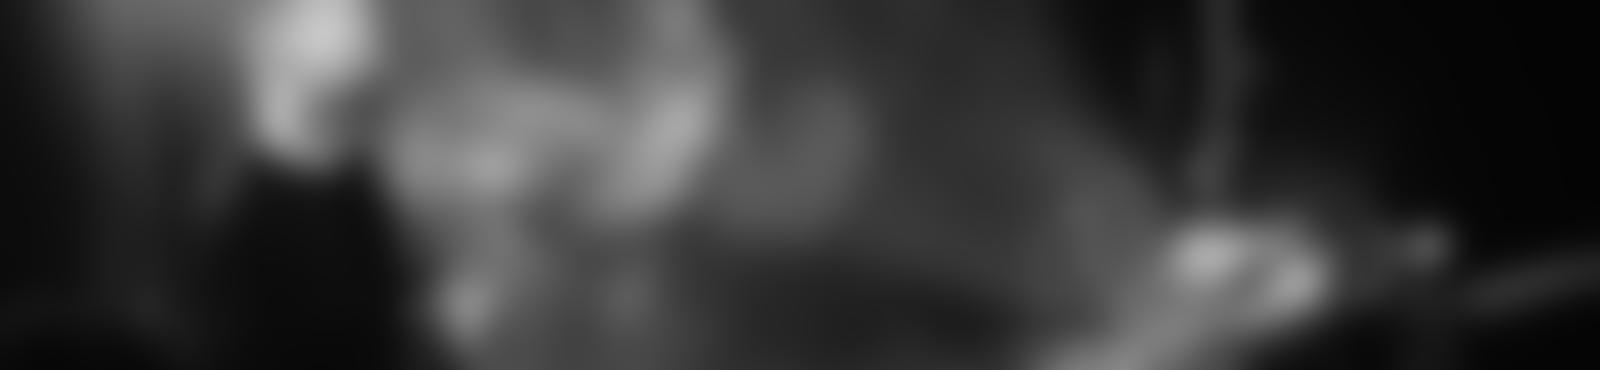 Blurred 55515743 2893 439c 8180 ec89f835cfa6